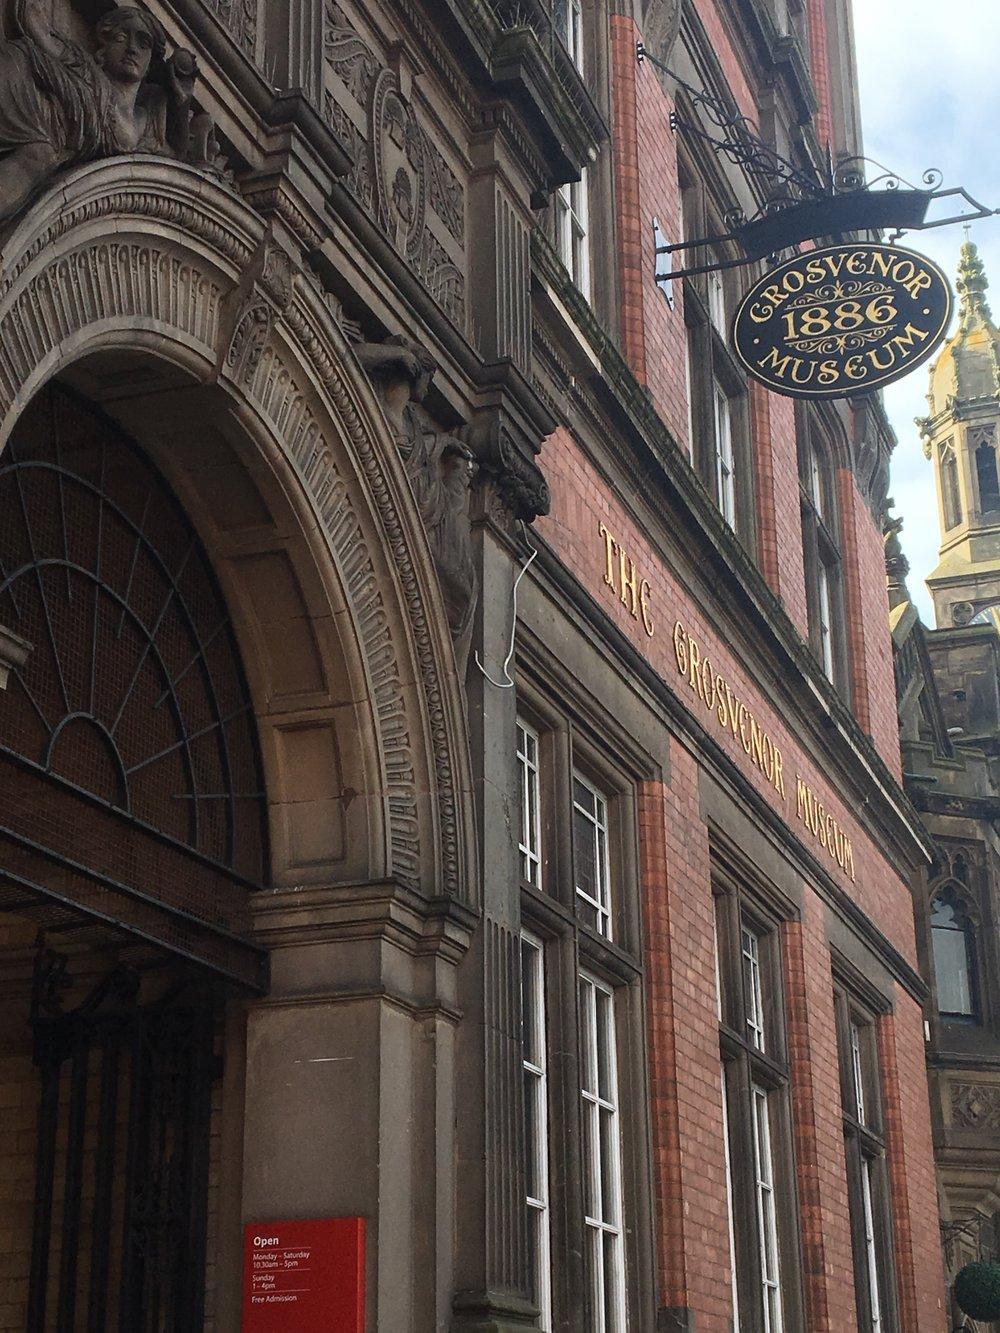 The Grosvenor Museum in Chester